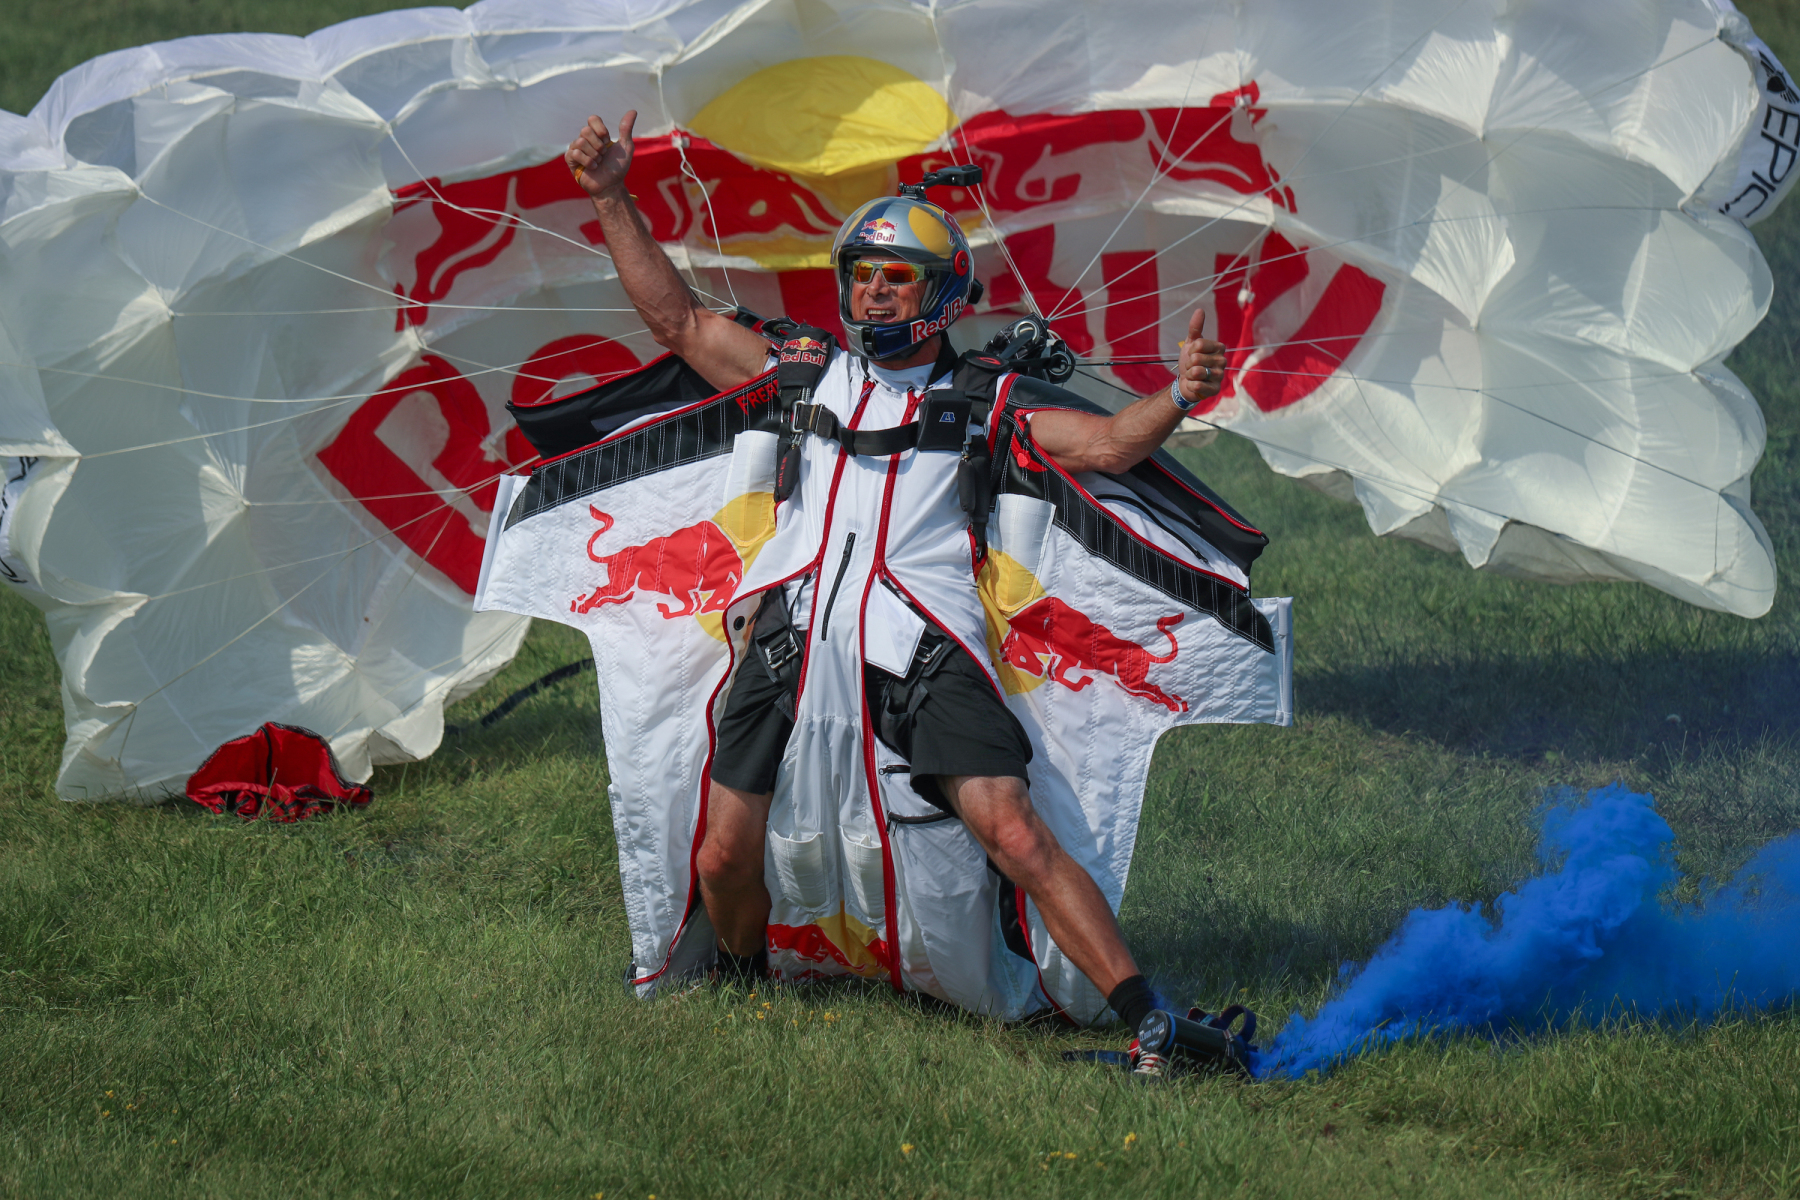 Red Bull Air Force Skydiver by Art Eichmann